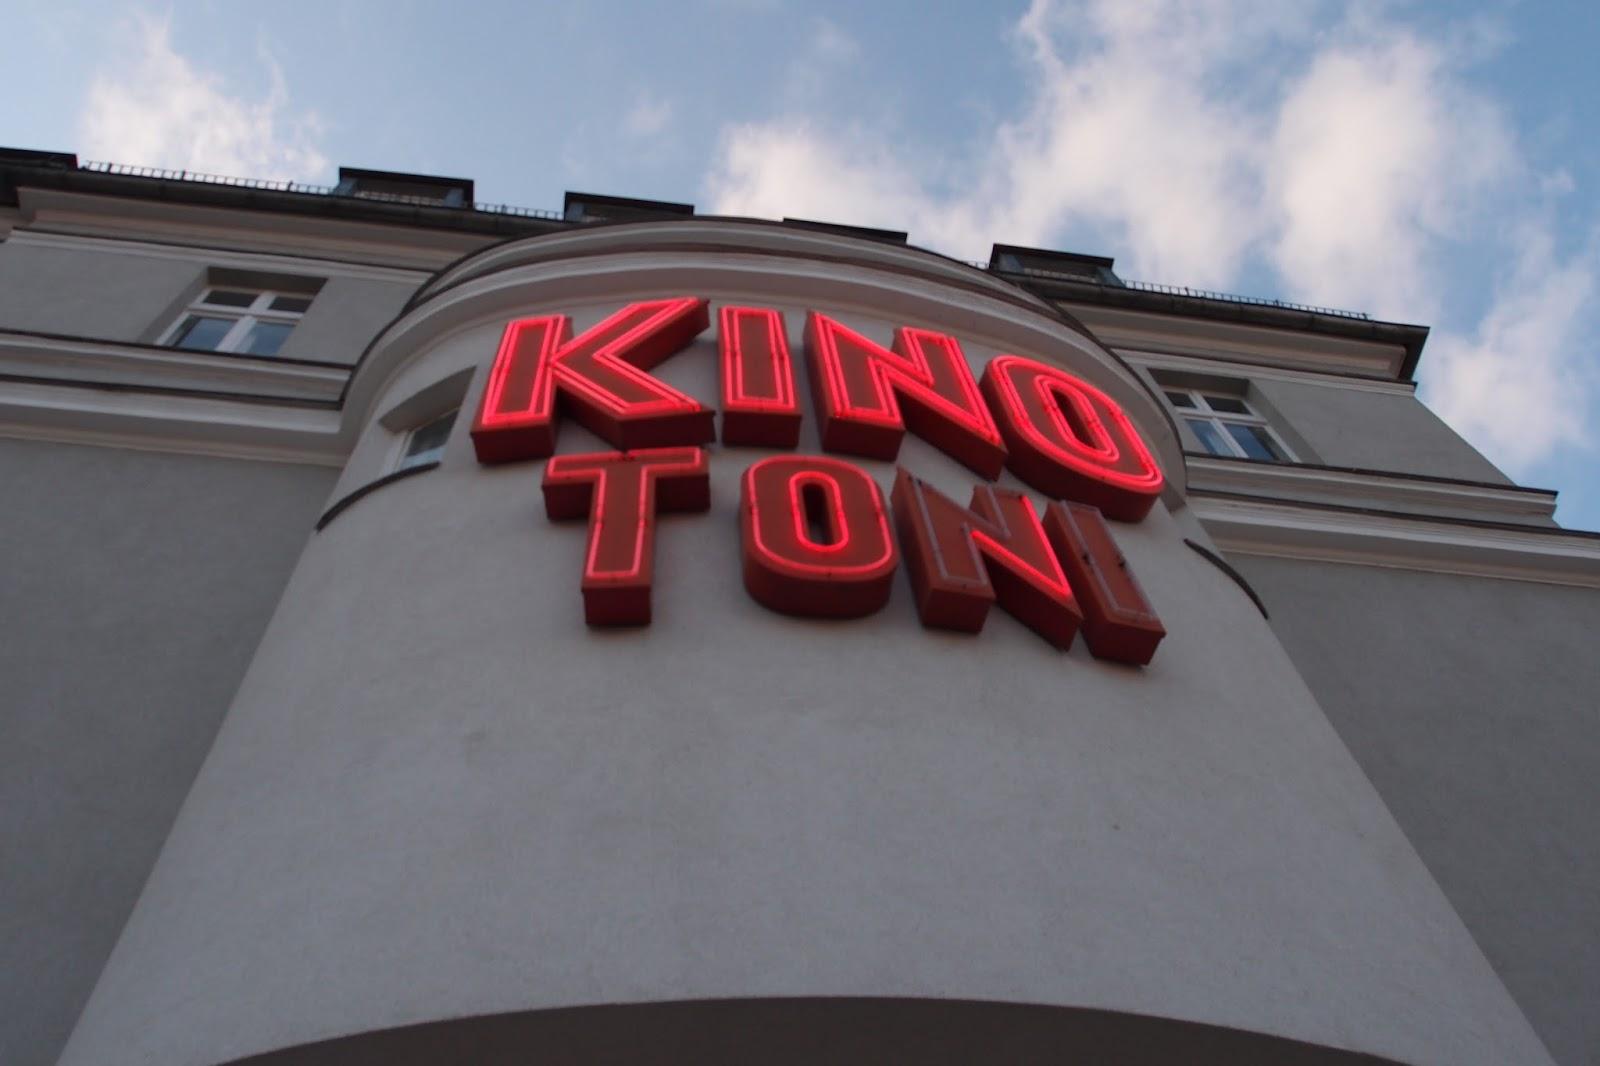 Kino Toni Und Tonino